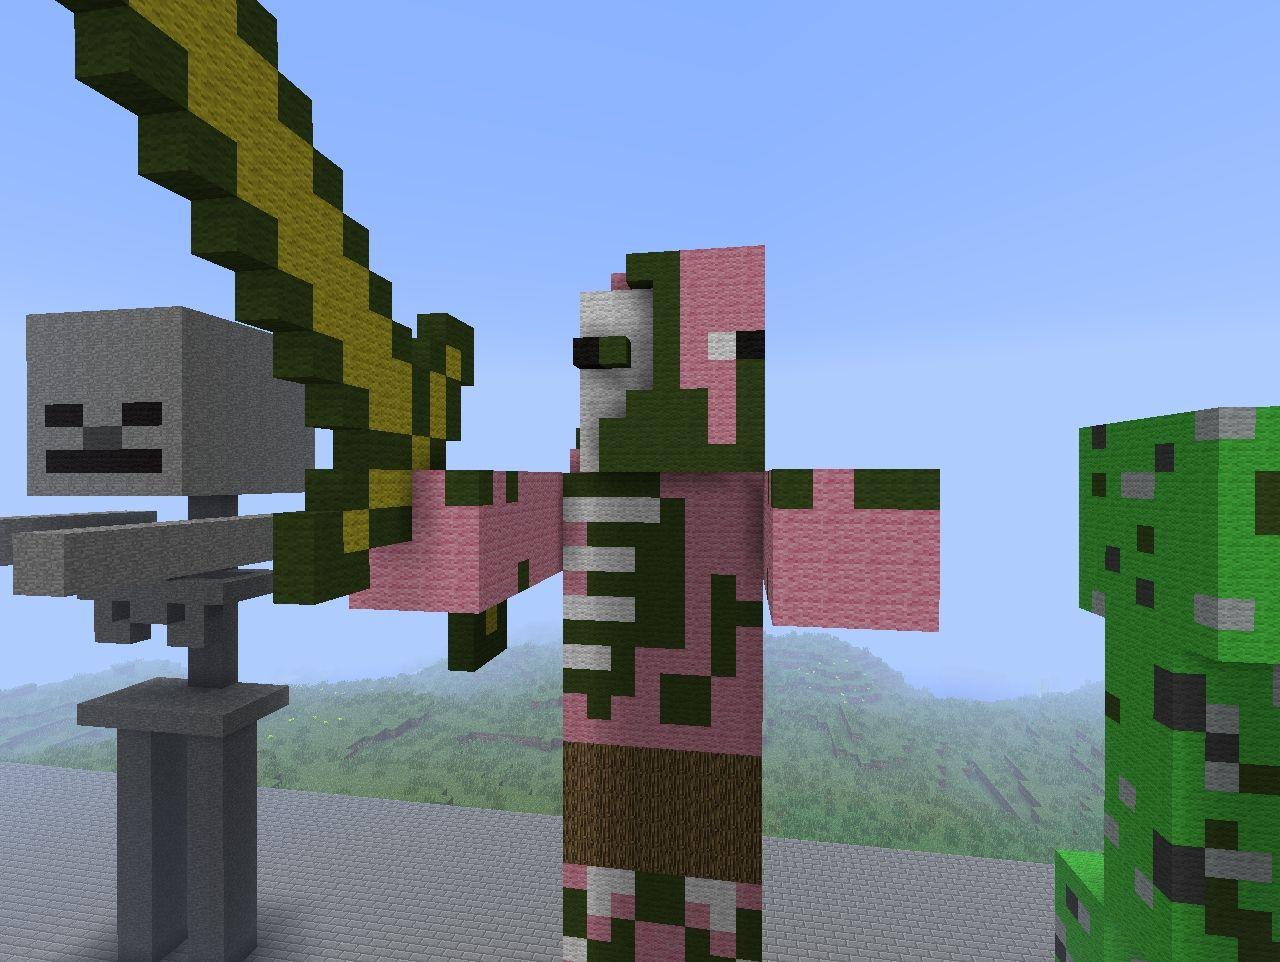 Pixel Art Zombie images